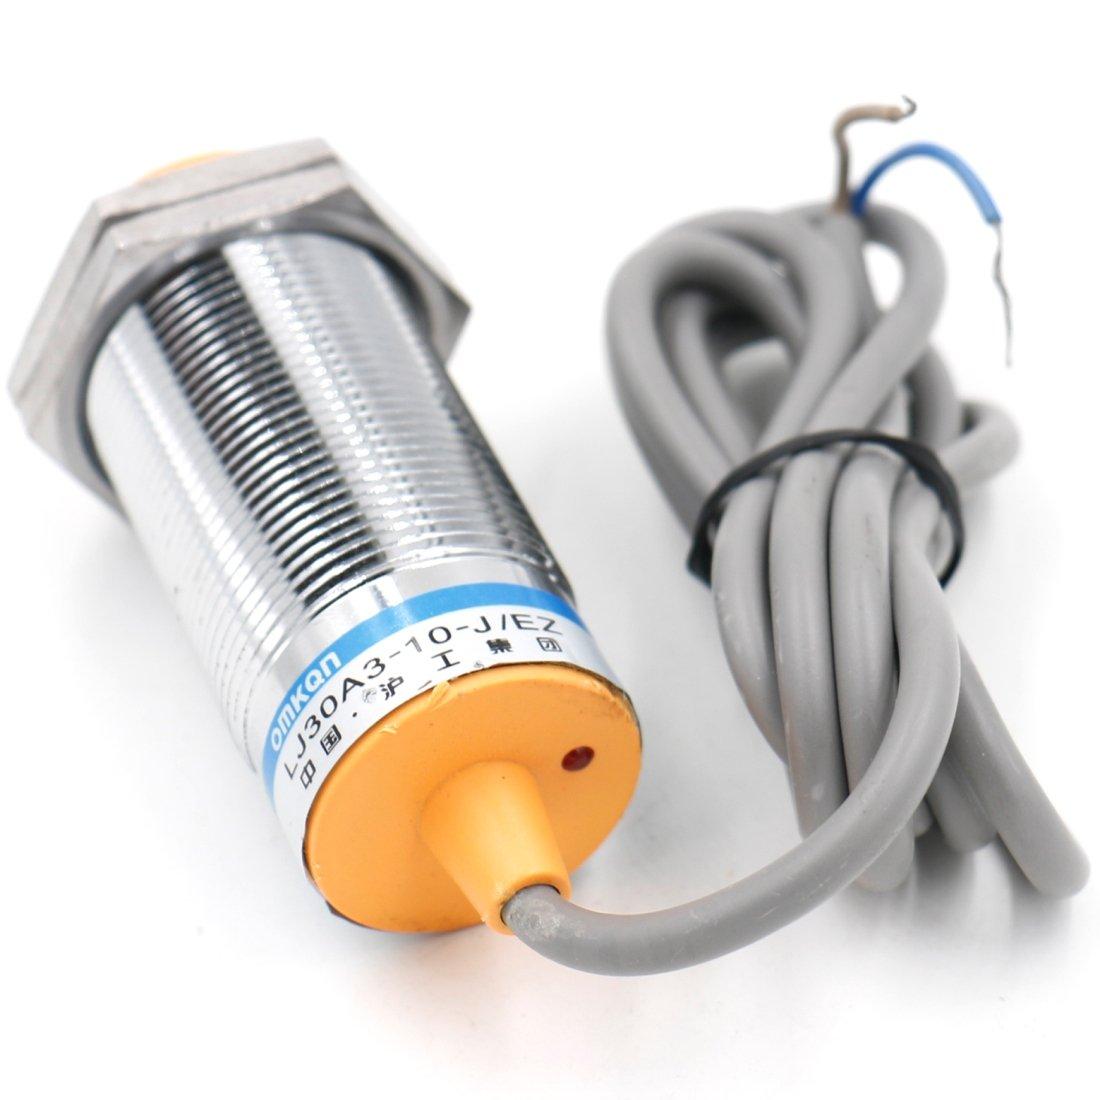 heschen Sensor de proximidad inductivos interruptor LJ30 A3 - 10-J/EZ detector 10 mm 90 - 250 VAC 400 mA NO Normalmente Abierto (alambre de) 2: Amazon.es: ...